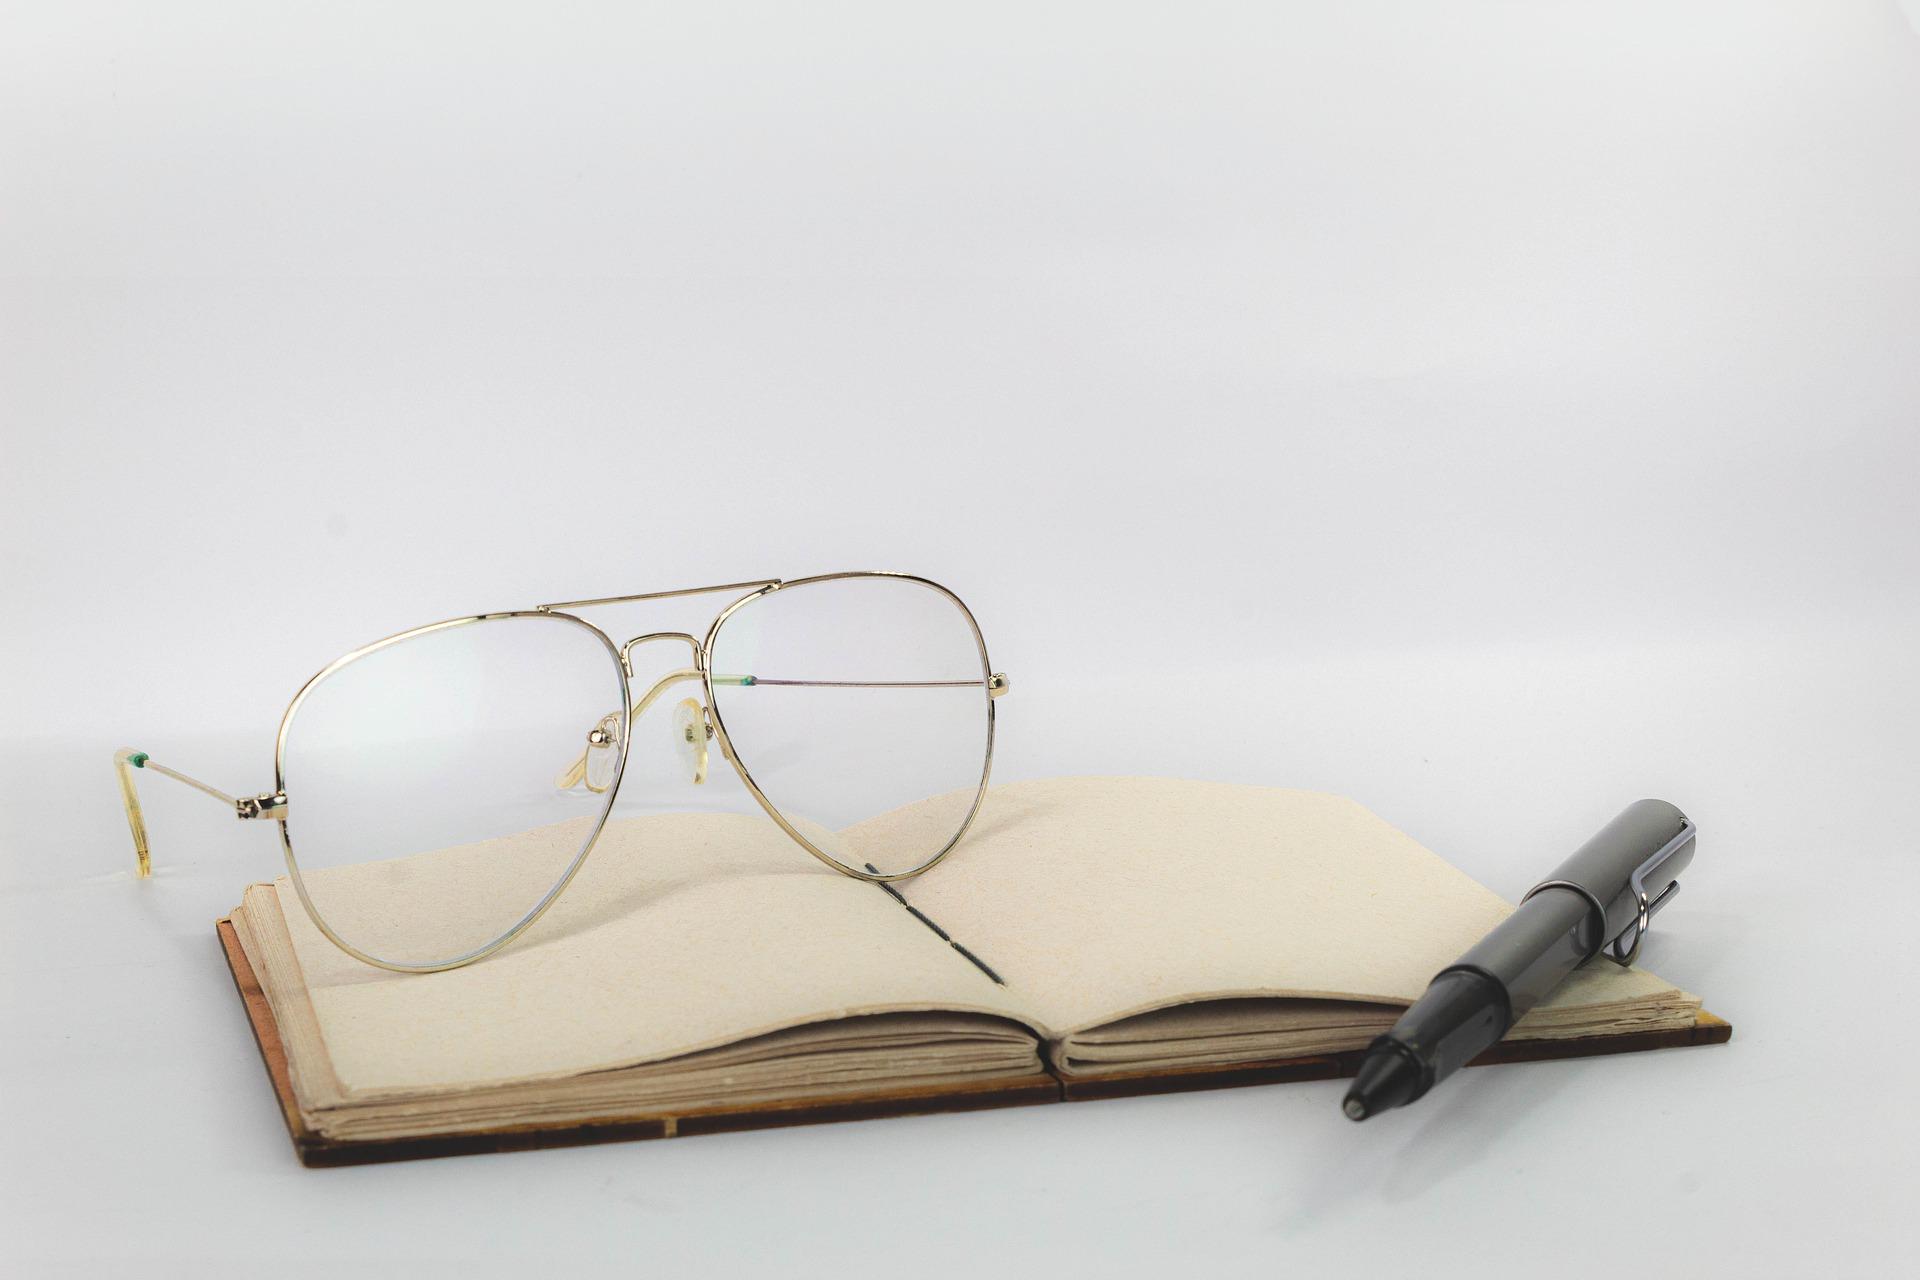 notebook-4725867_1920.jpg